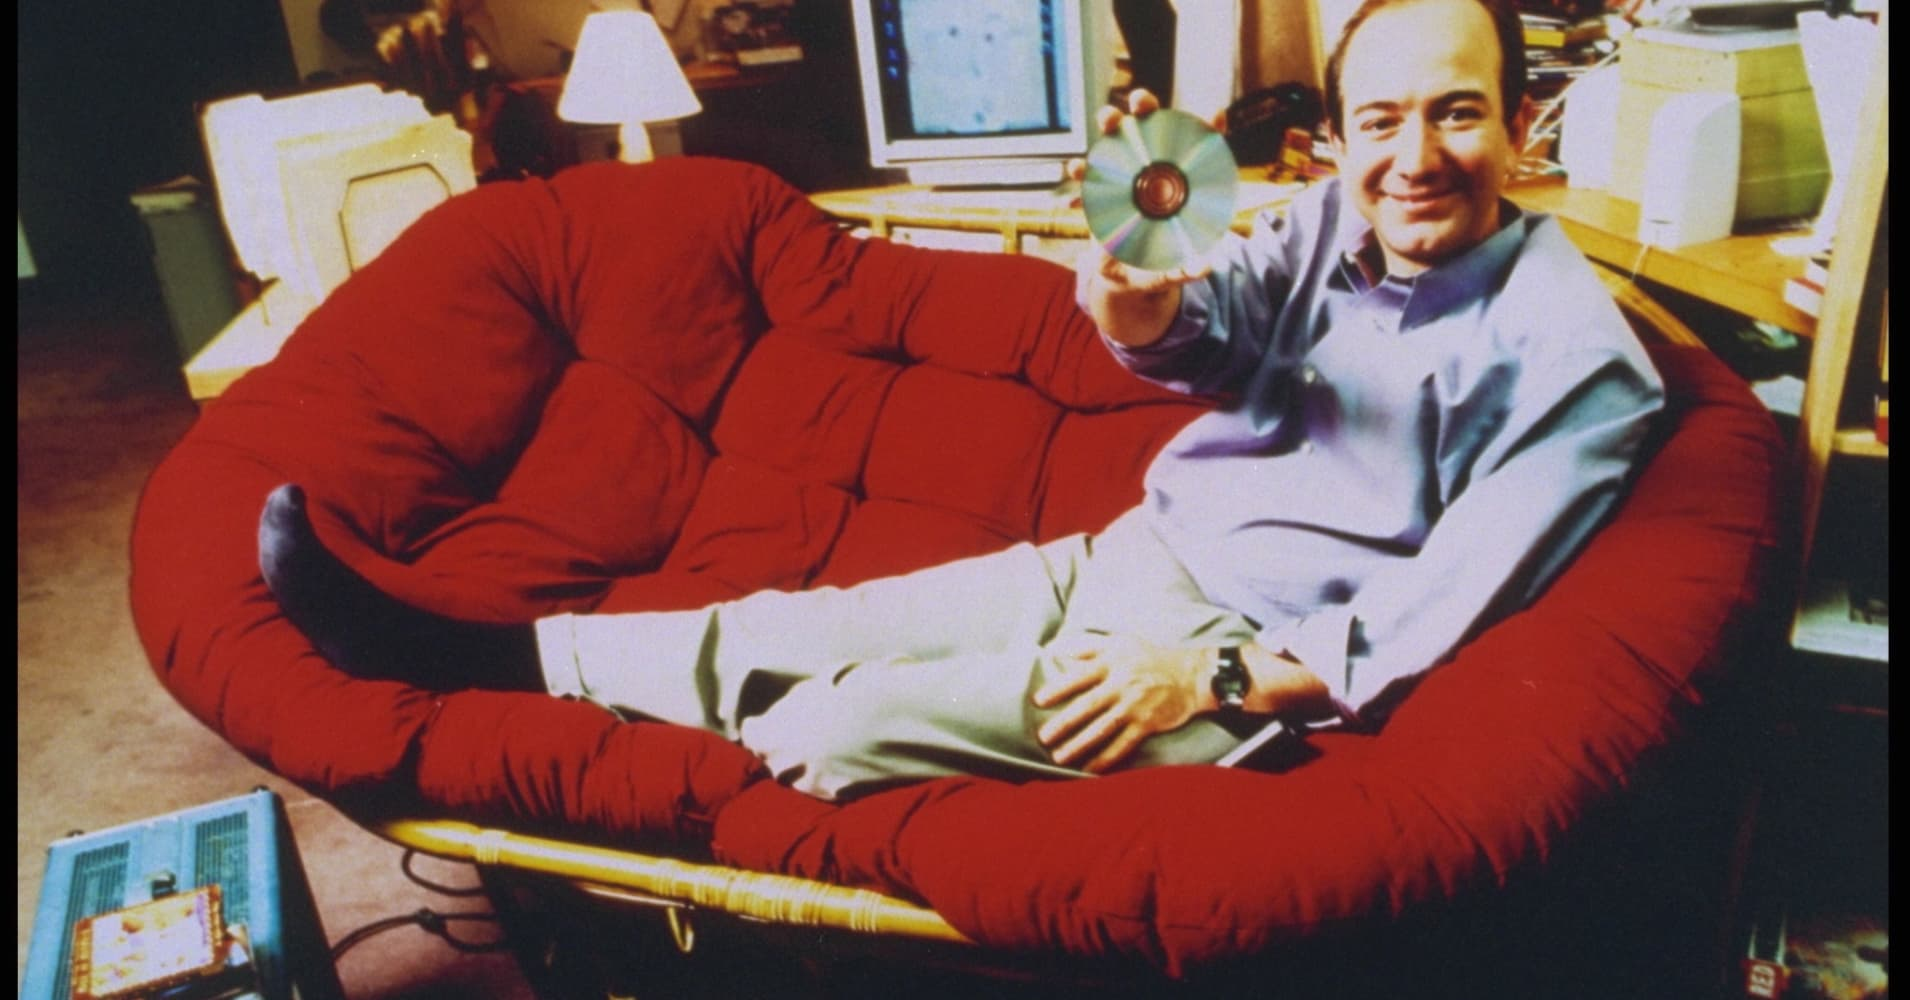 Jeff Bezos in 1999